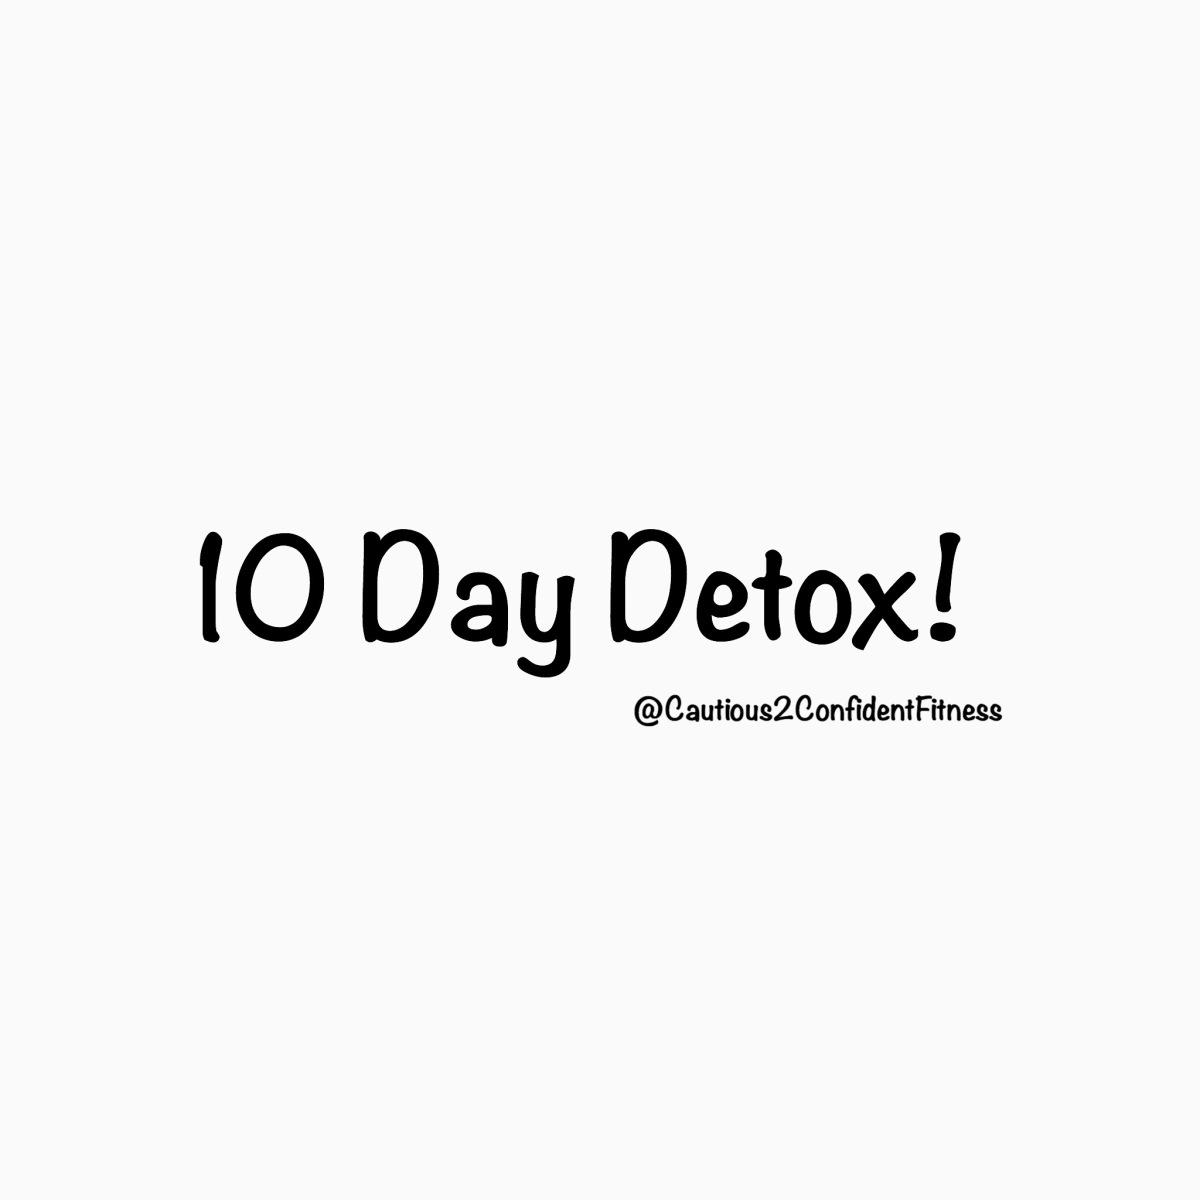 Detox Ready!